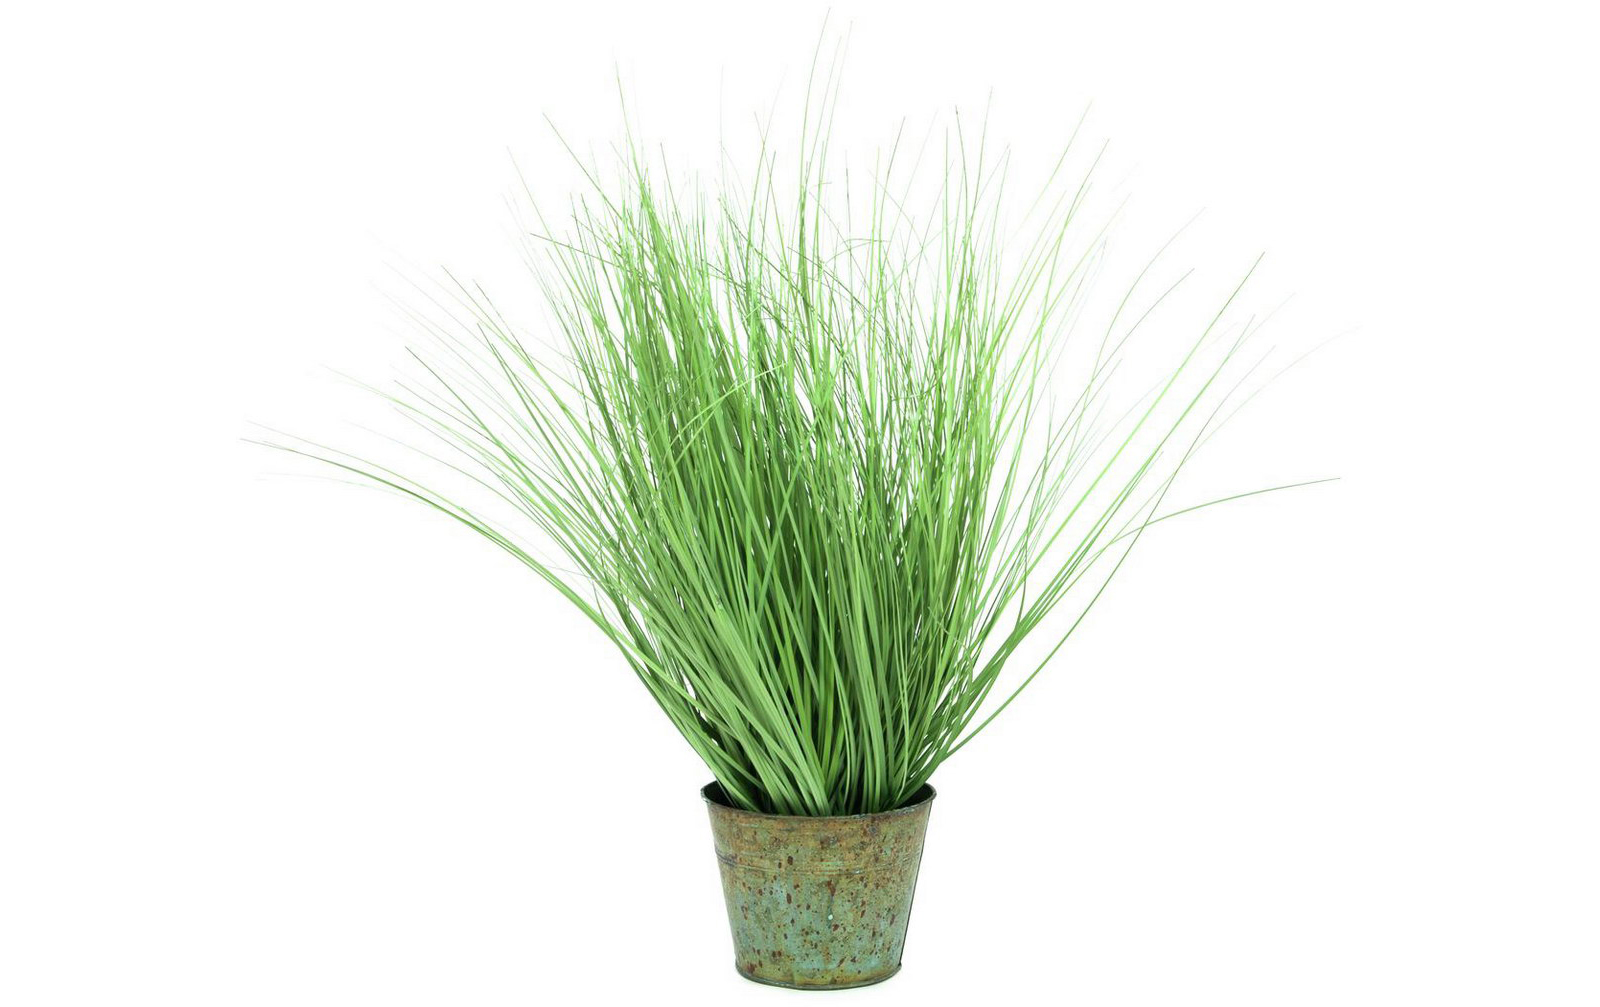 europalms-ziergras-65cm-kunststoffpflanze